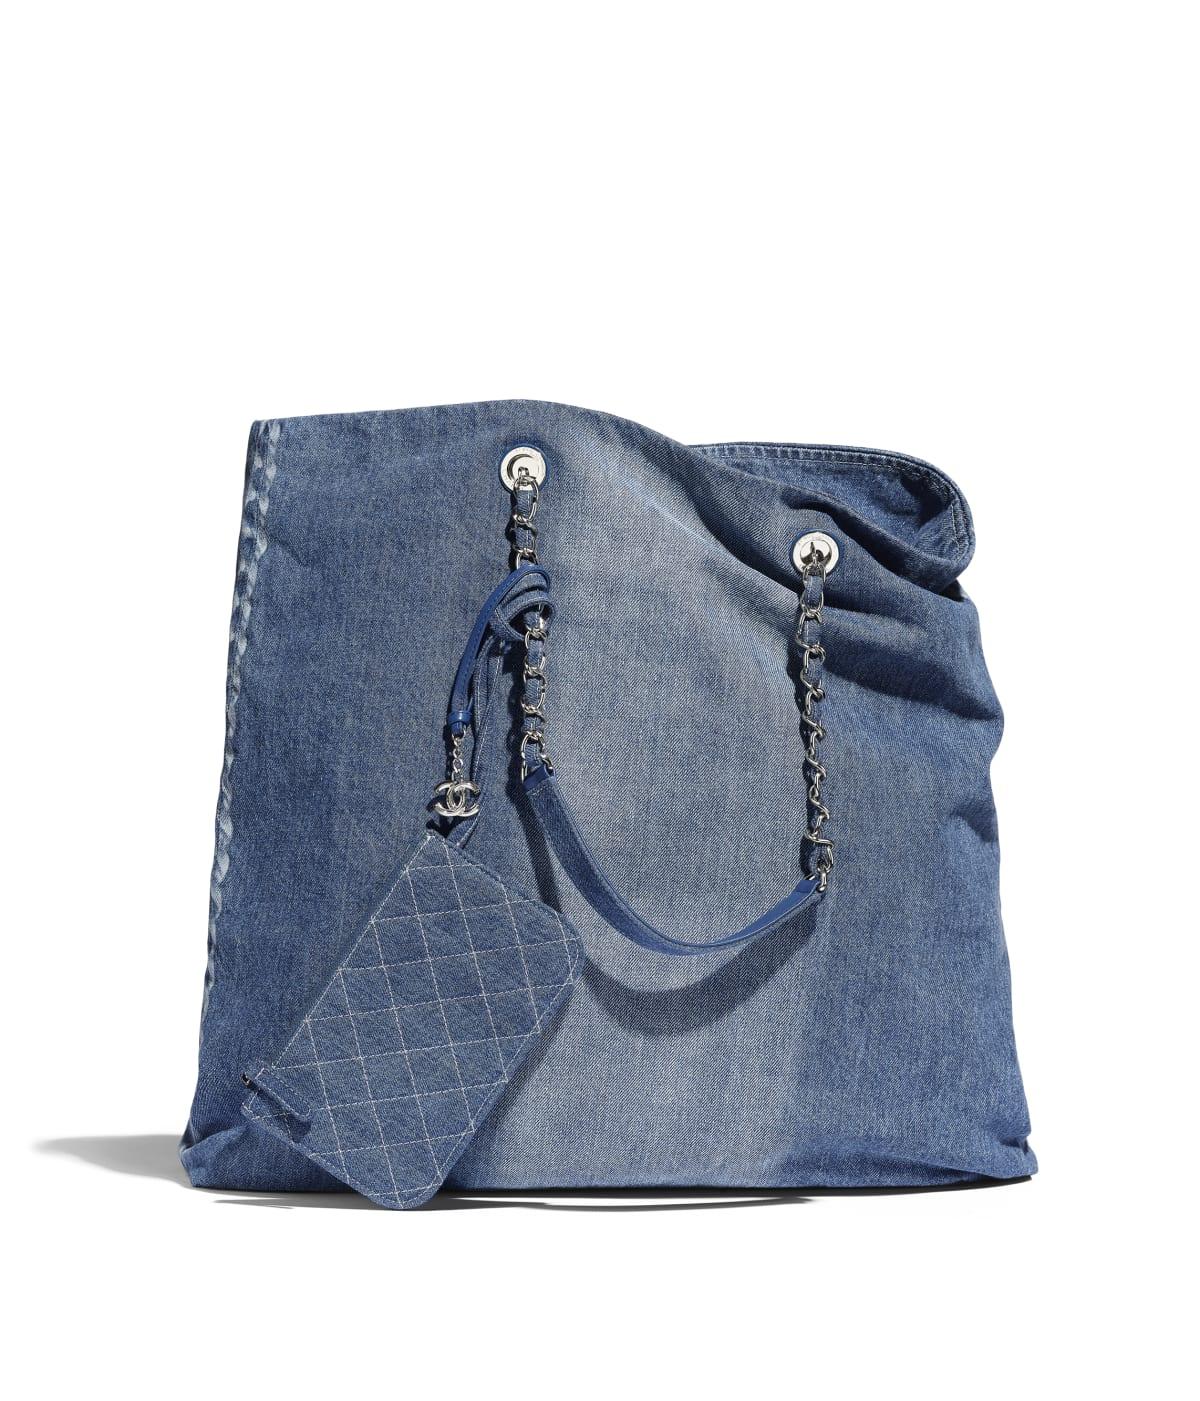 f4c597a1873 Large Shopping Bag, printed denim & silver-tone metal, blue - CHANEL